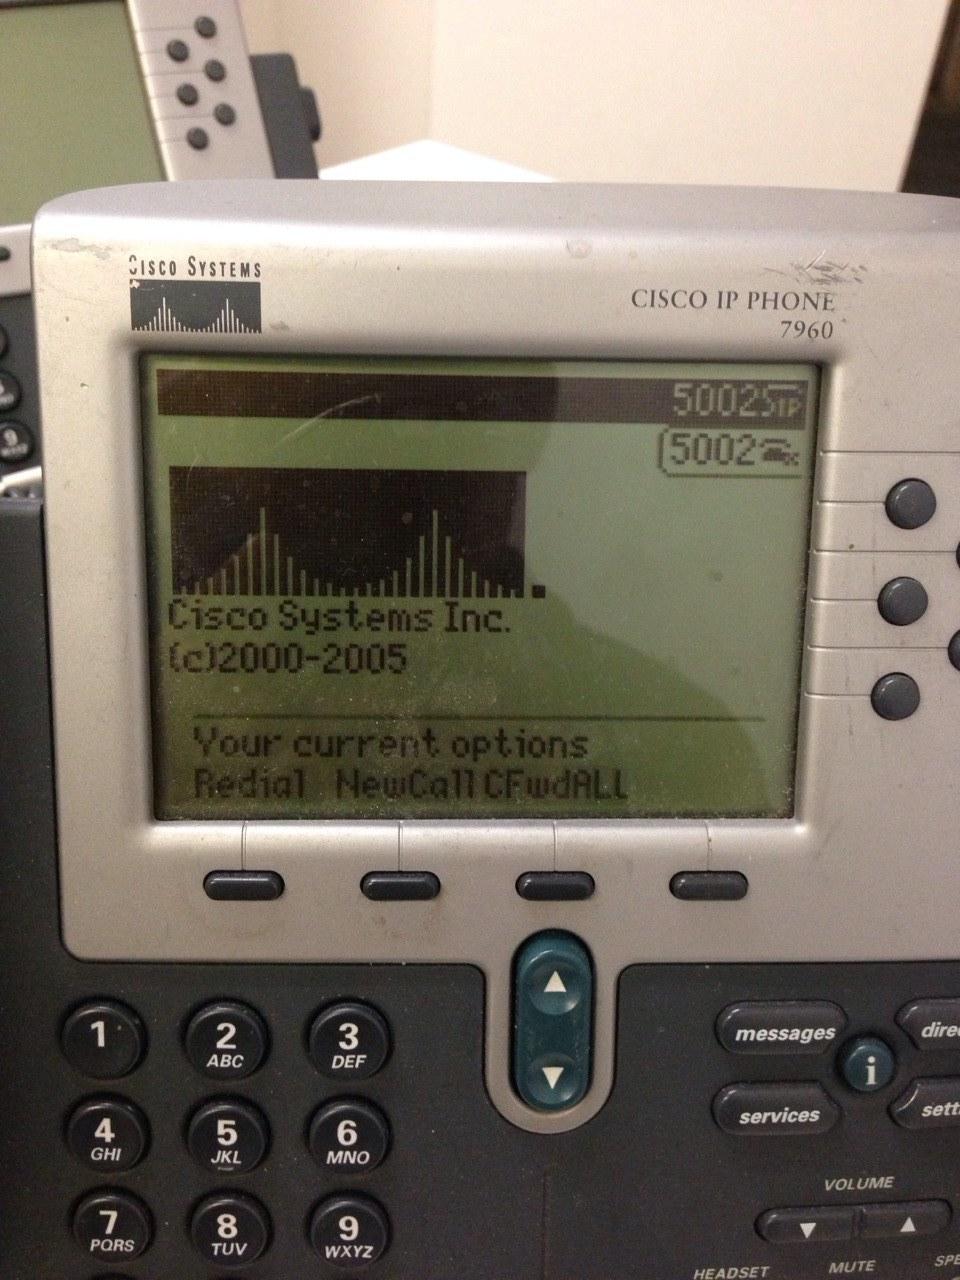 Cisco 7960 IP Phone not registering wit    - Cisco Community